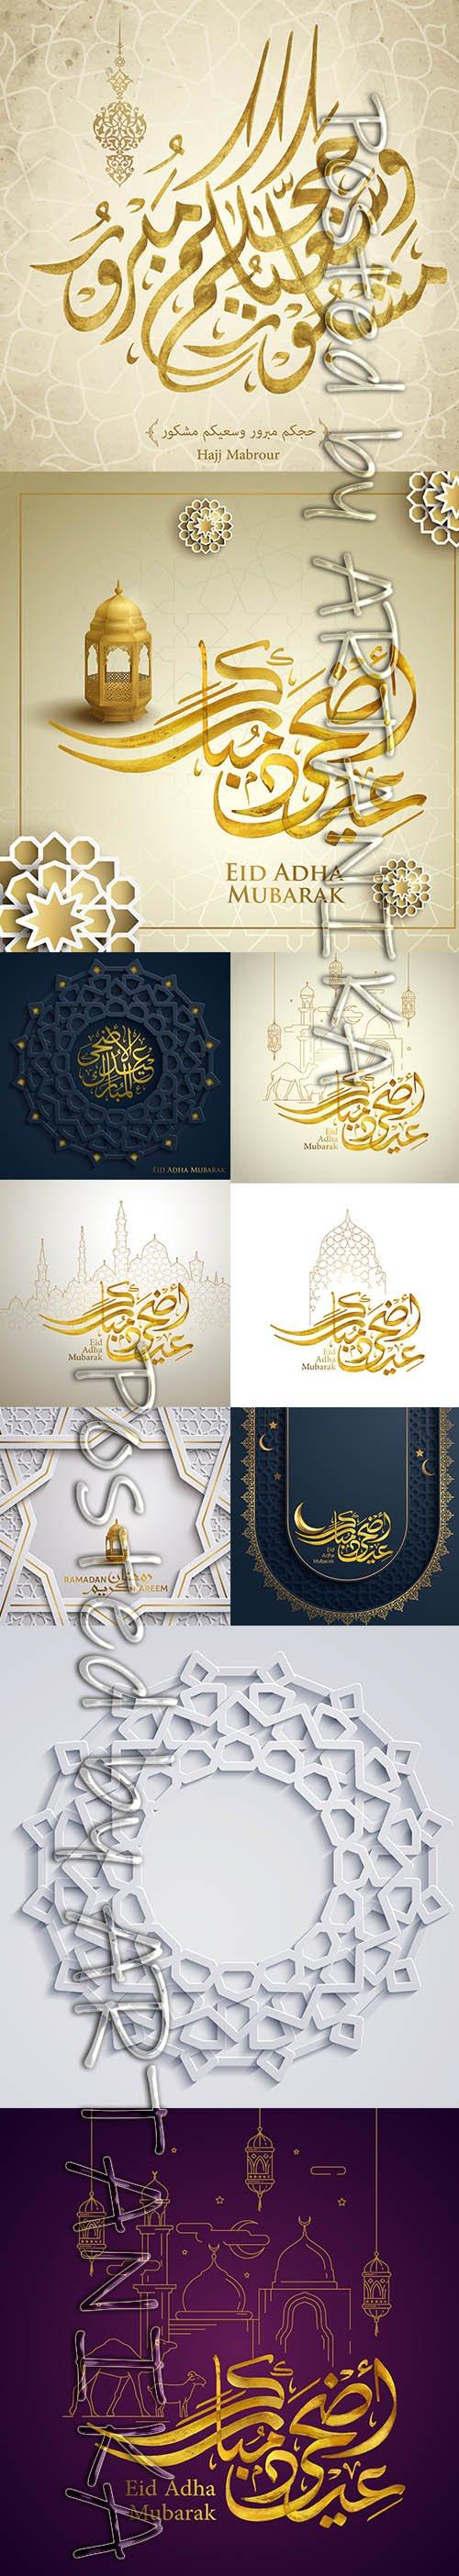 Eid Adha Mubarak Arabic Calligraphy Illustrations Set